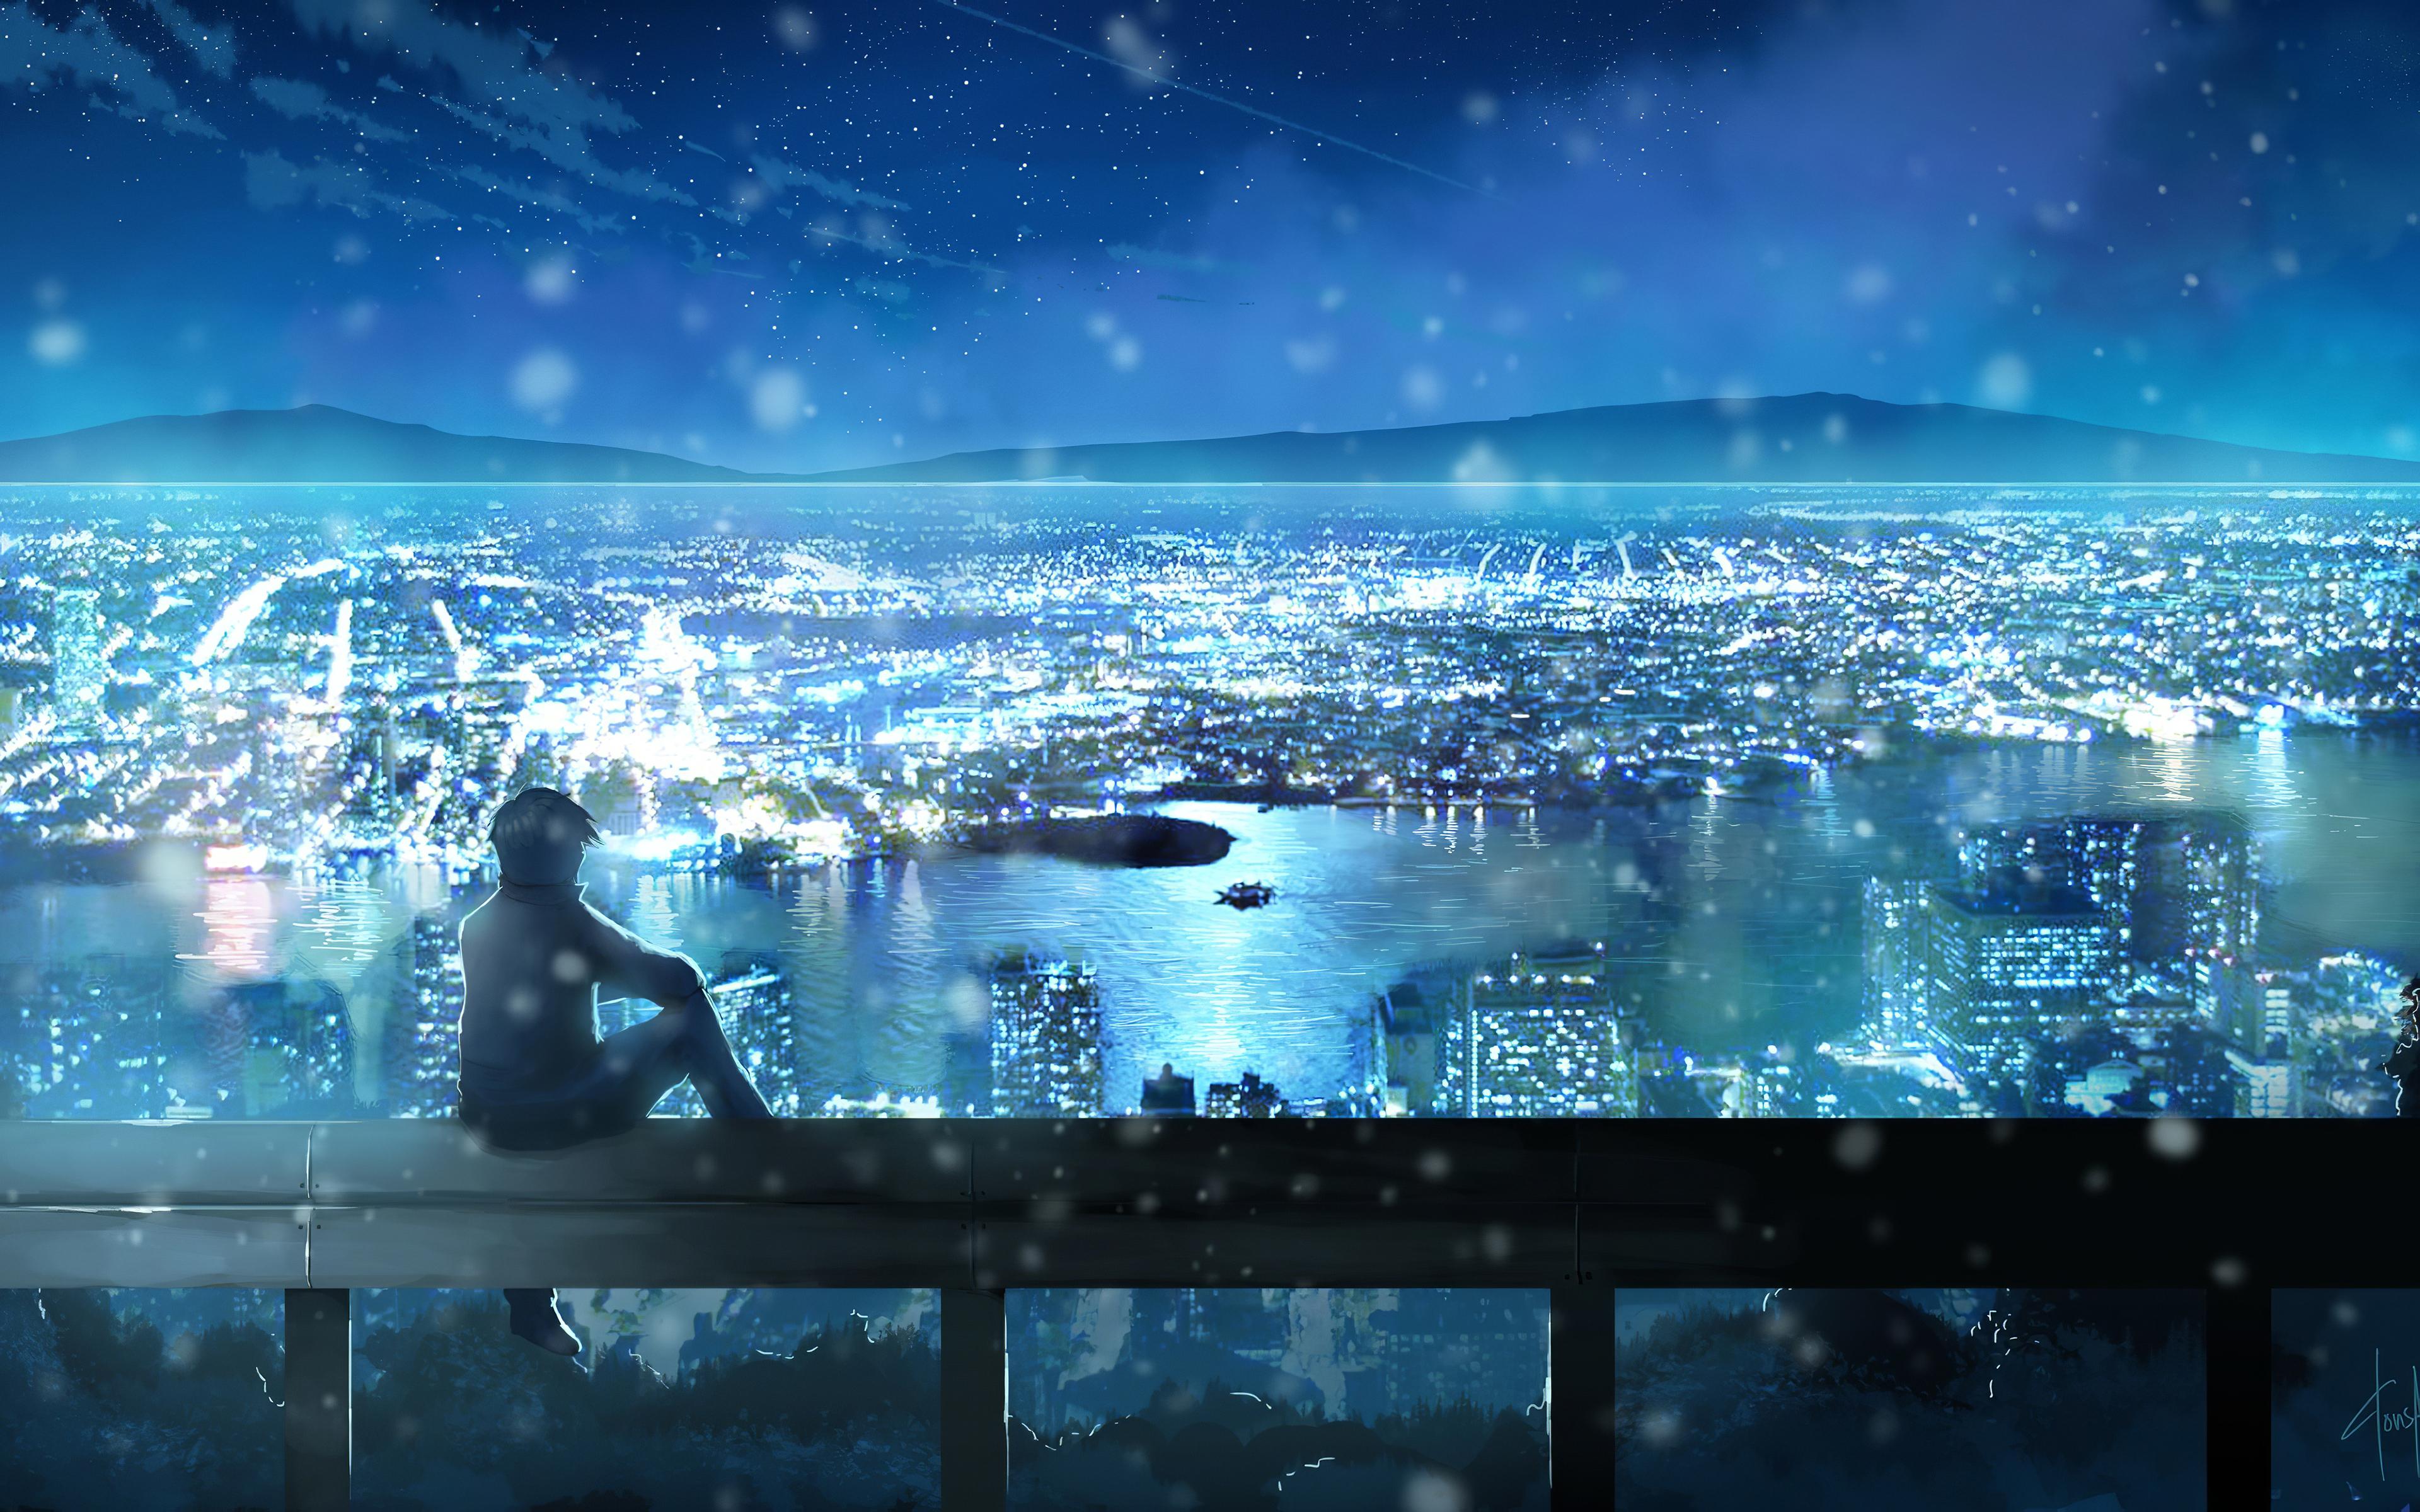 City Looks Nice From Here Anime 4k, HD Anime, 4k ...